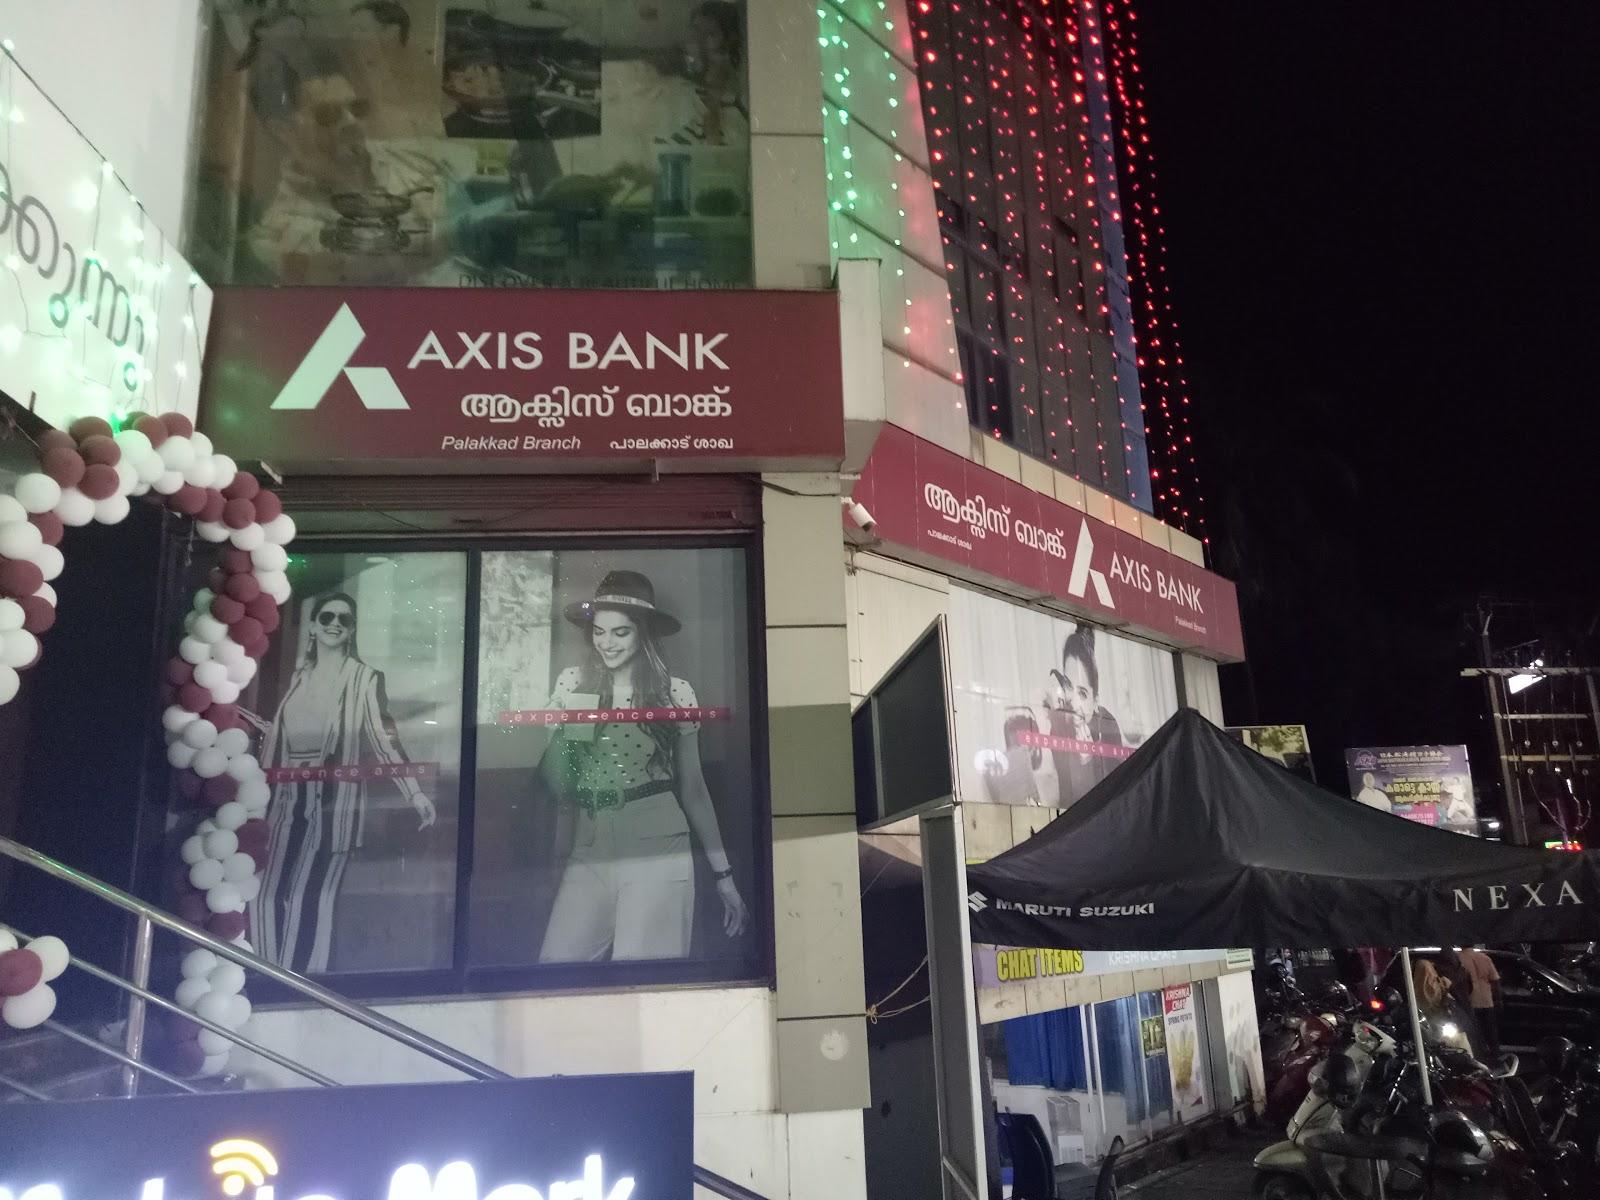 blood bank Axis Bank near Palakkad Kerala